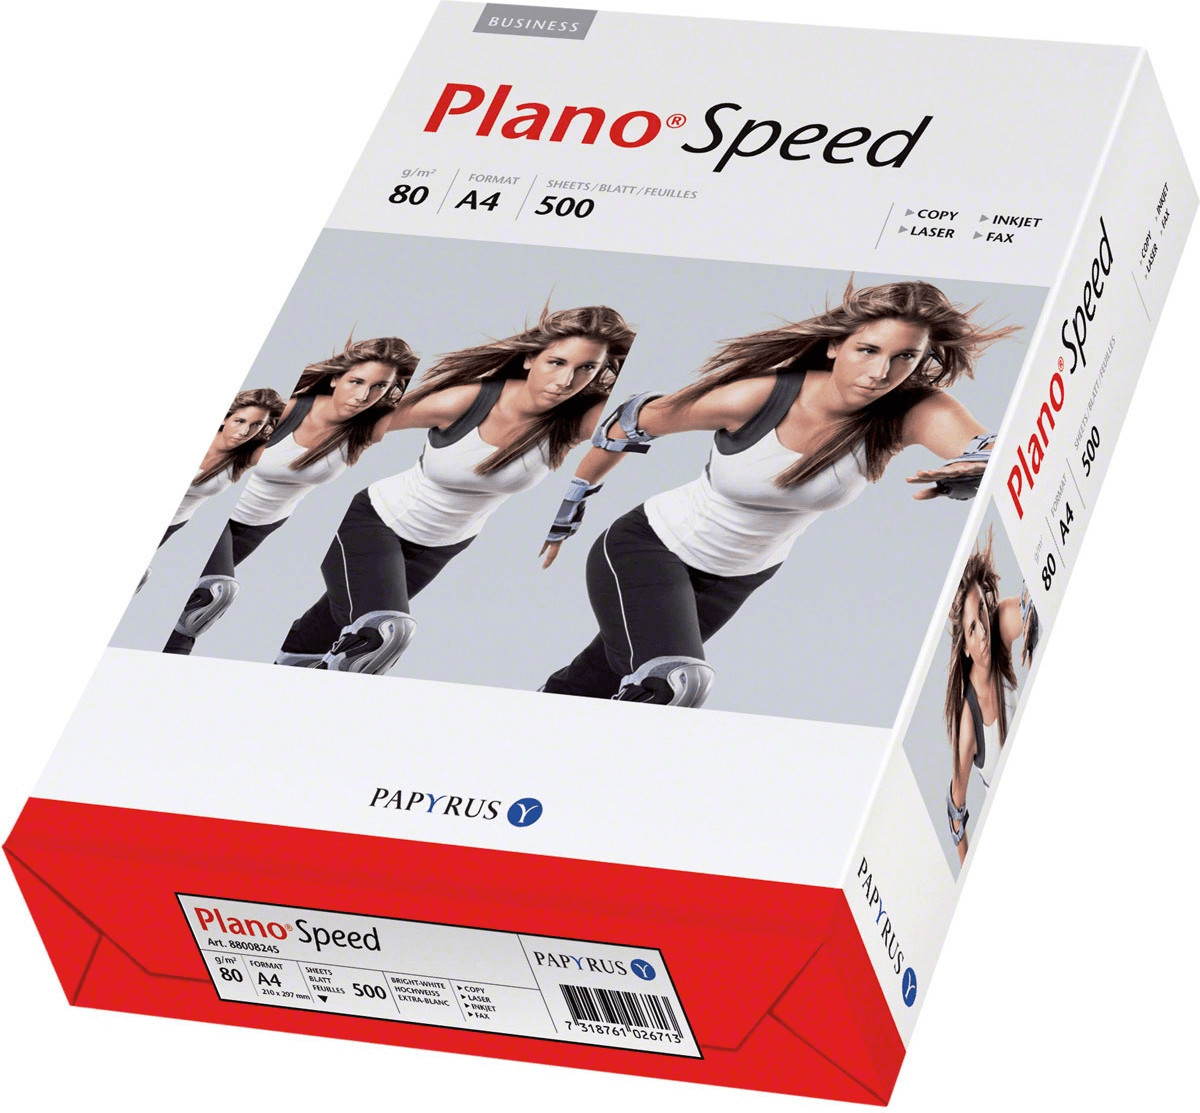 PLANOSPEED80A4